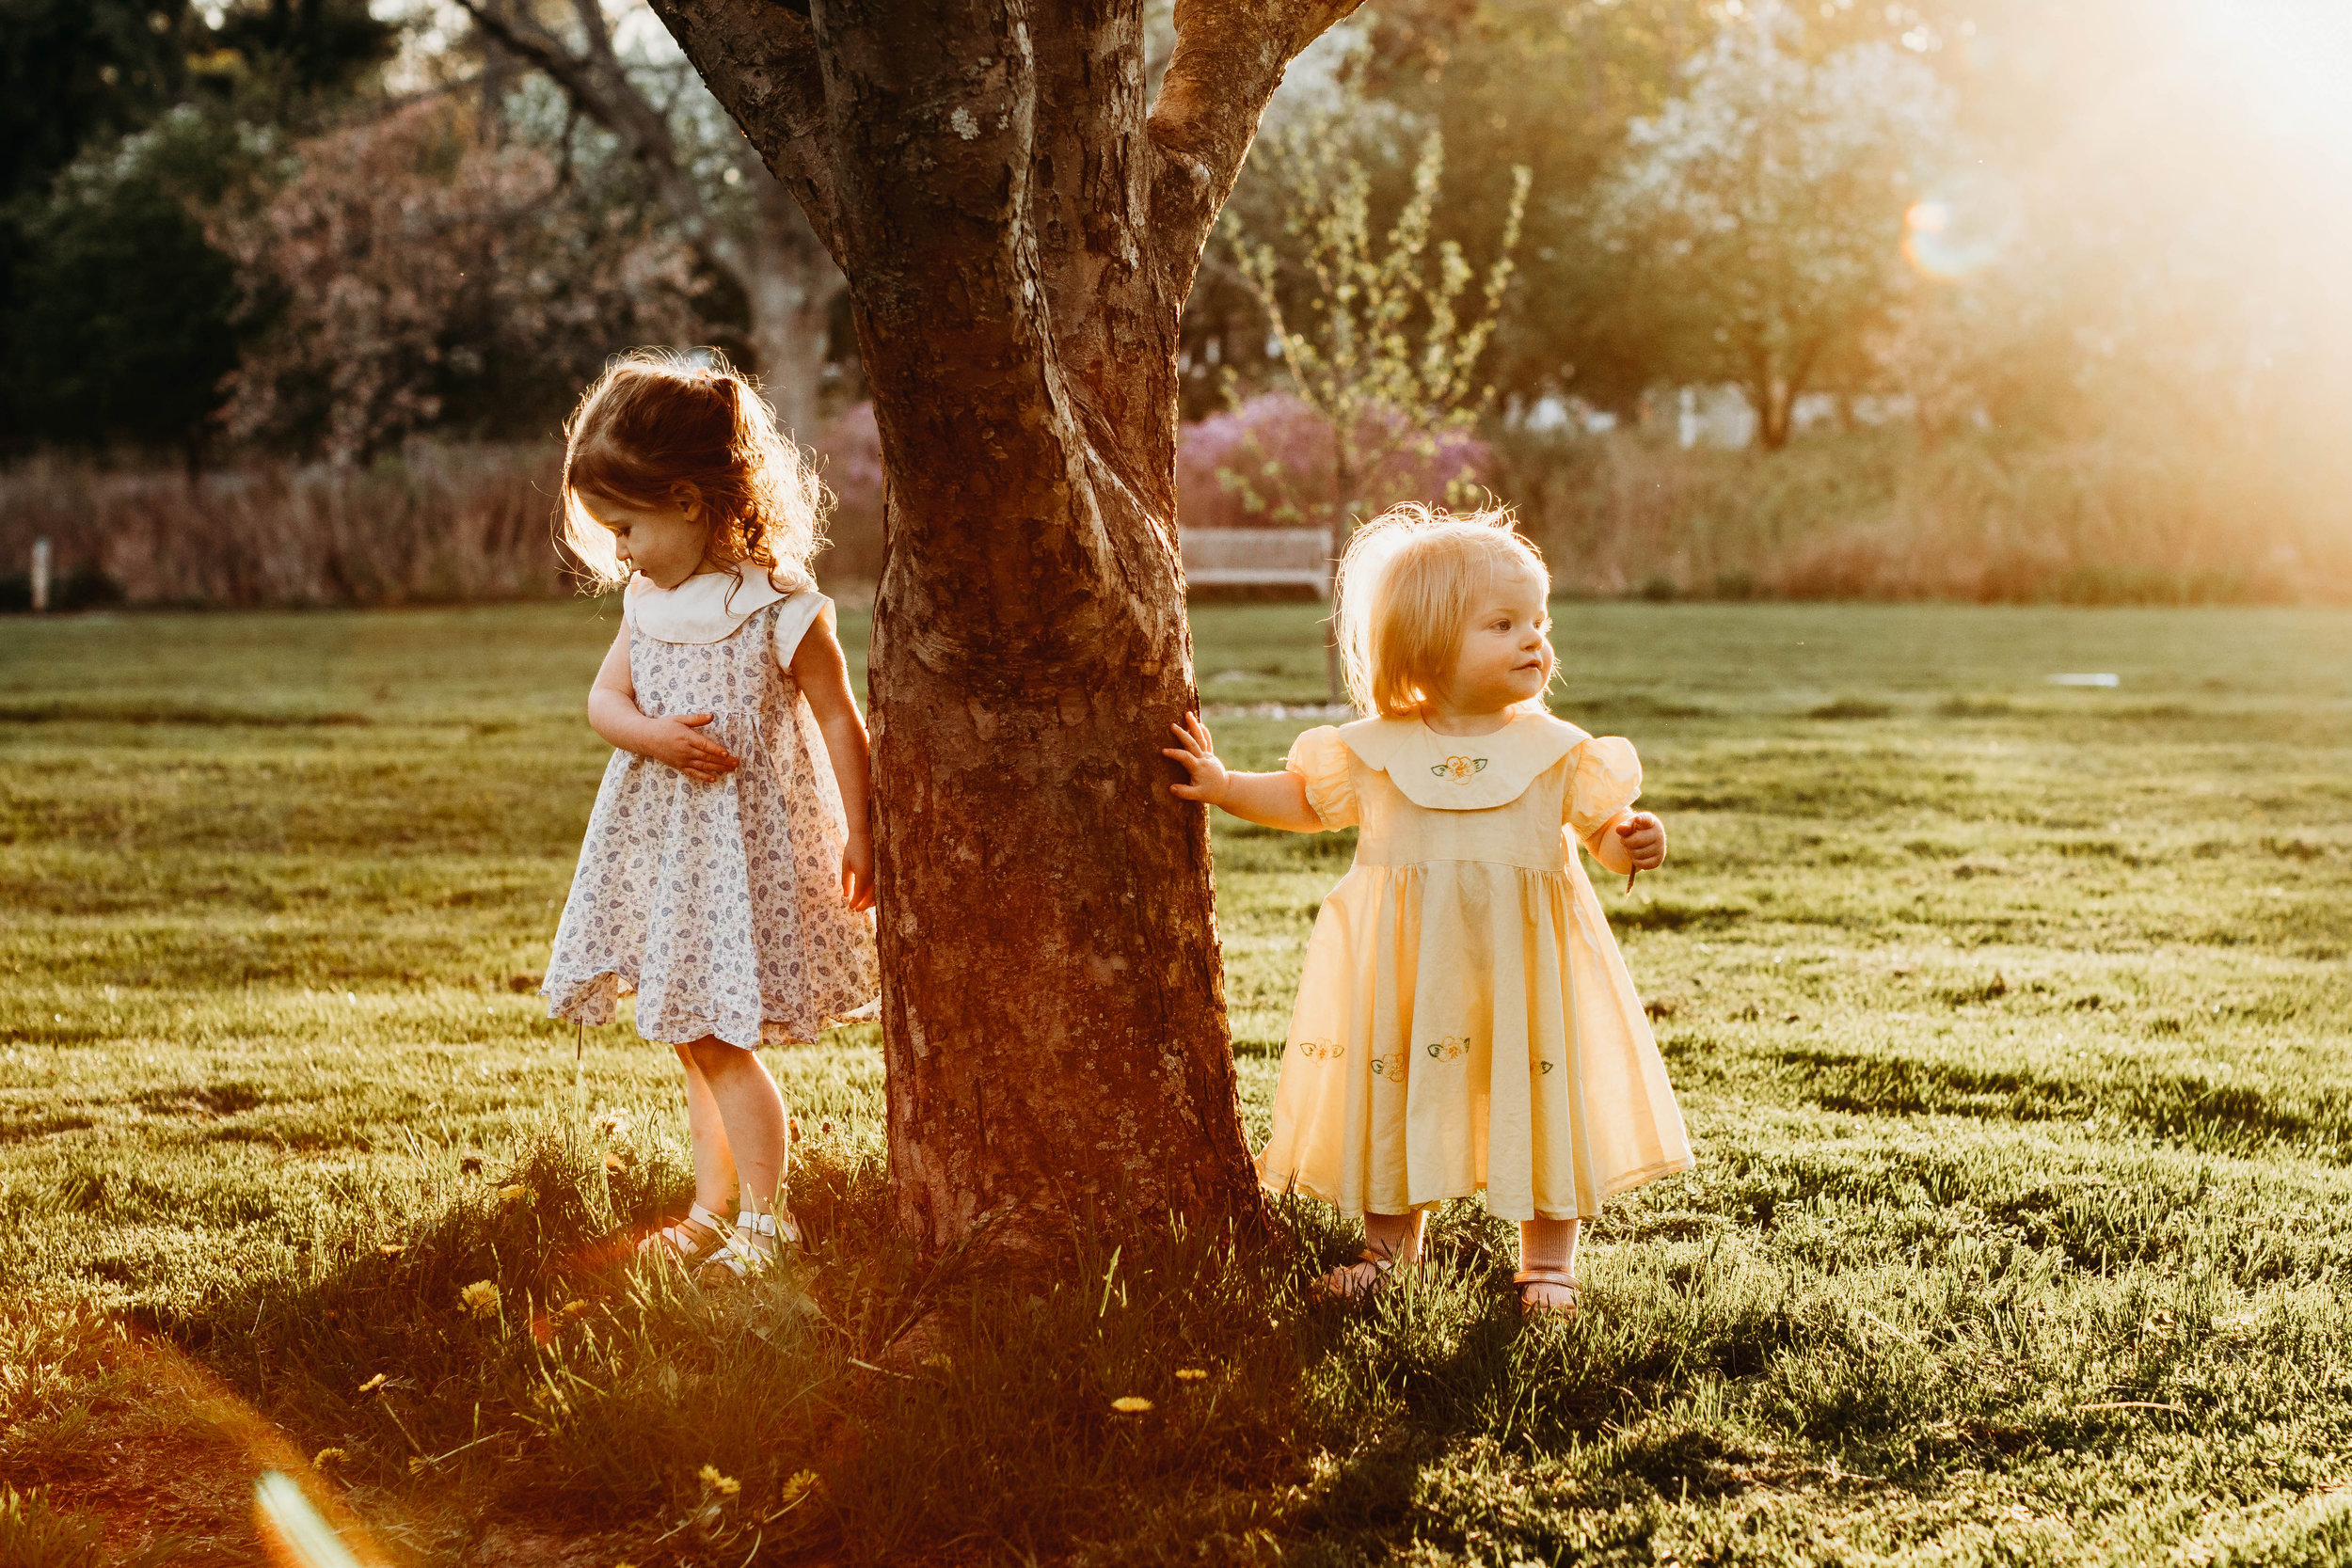 extended-family-photo-session-acton-arboretum-boston-family-photographer-8.jpg